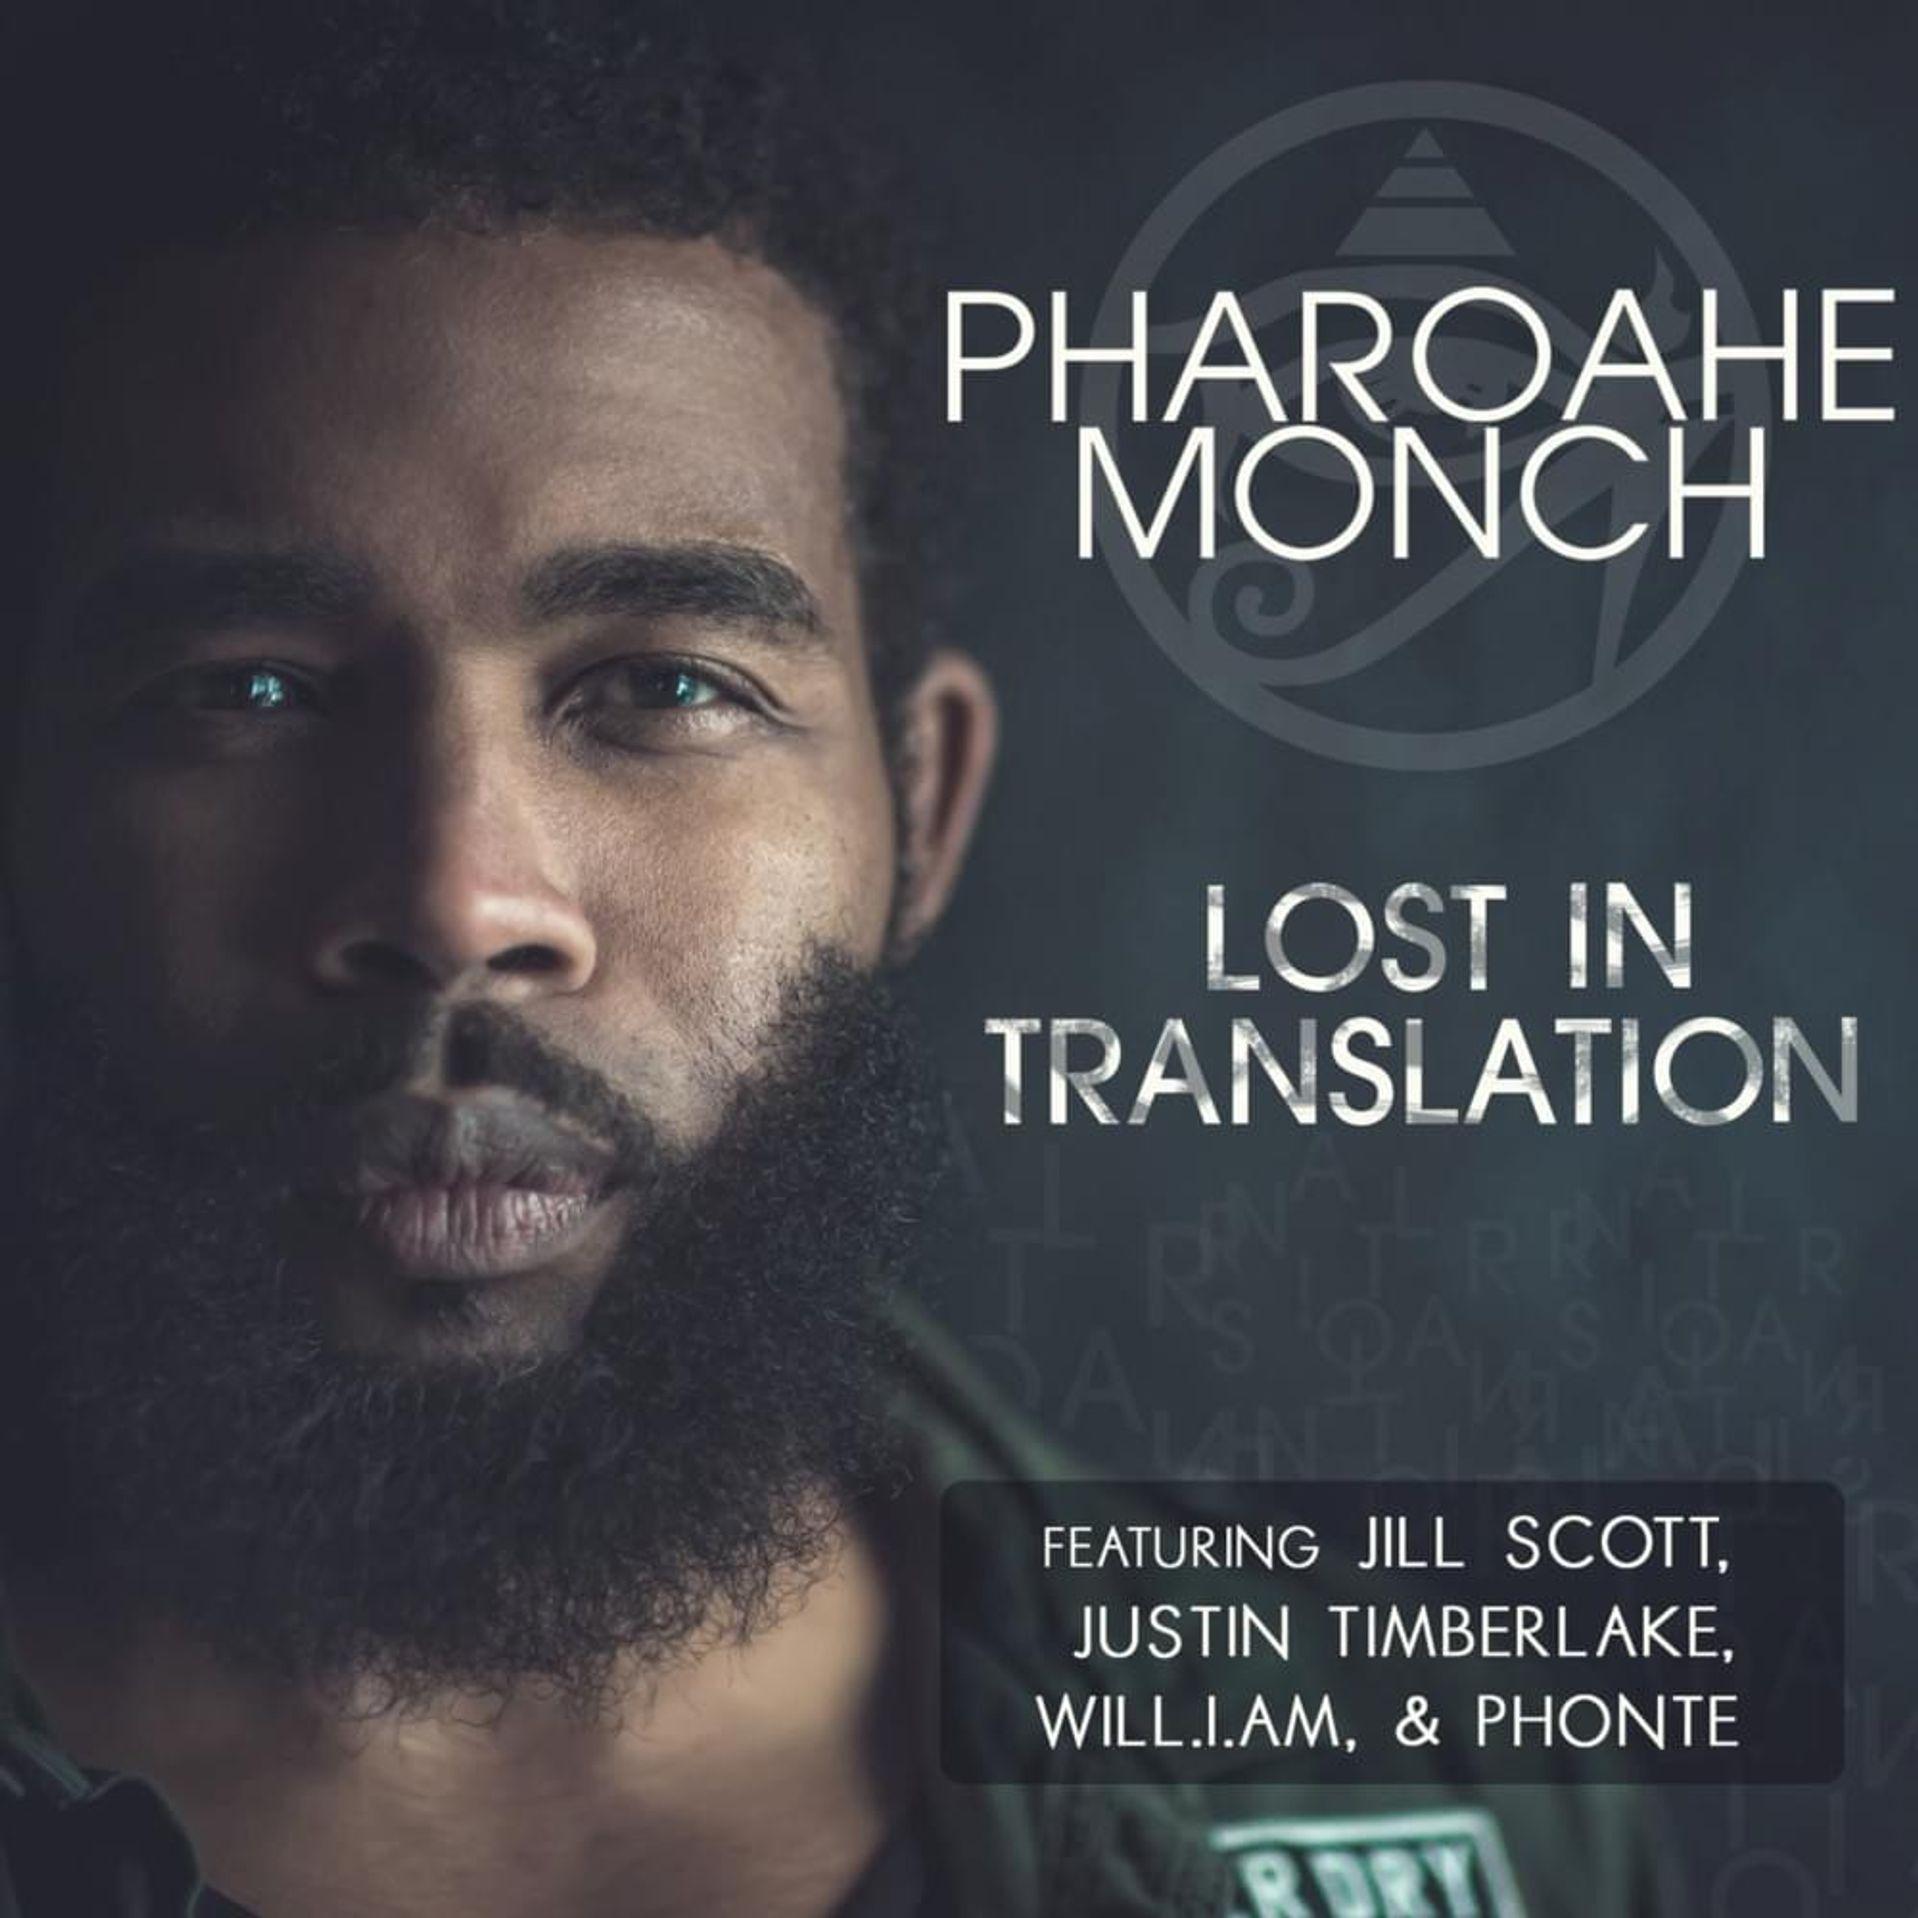 Album Title: Lost In Translation by: Pharoahe Monch